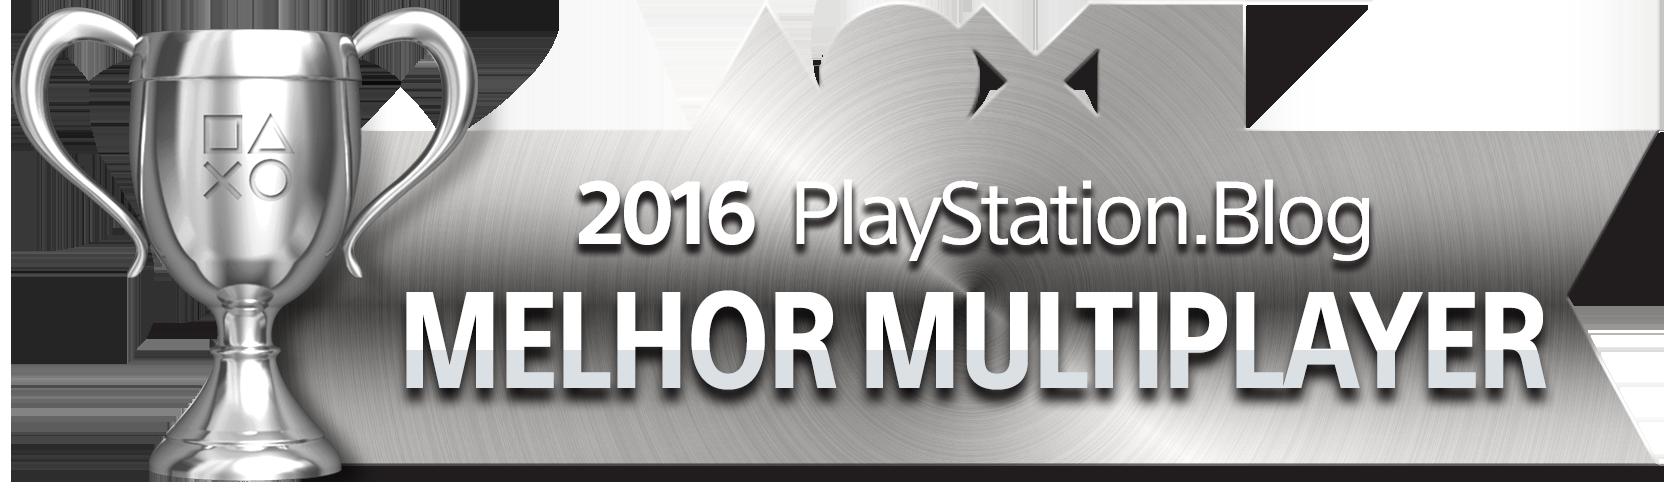 Melhor Multiplayer - Prata